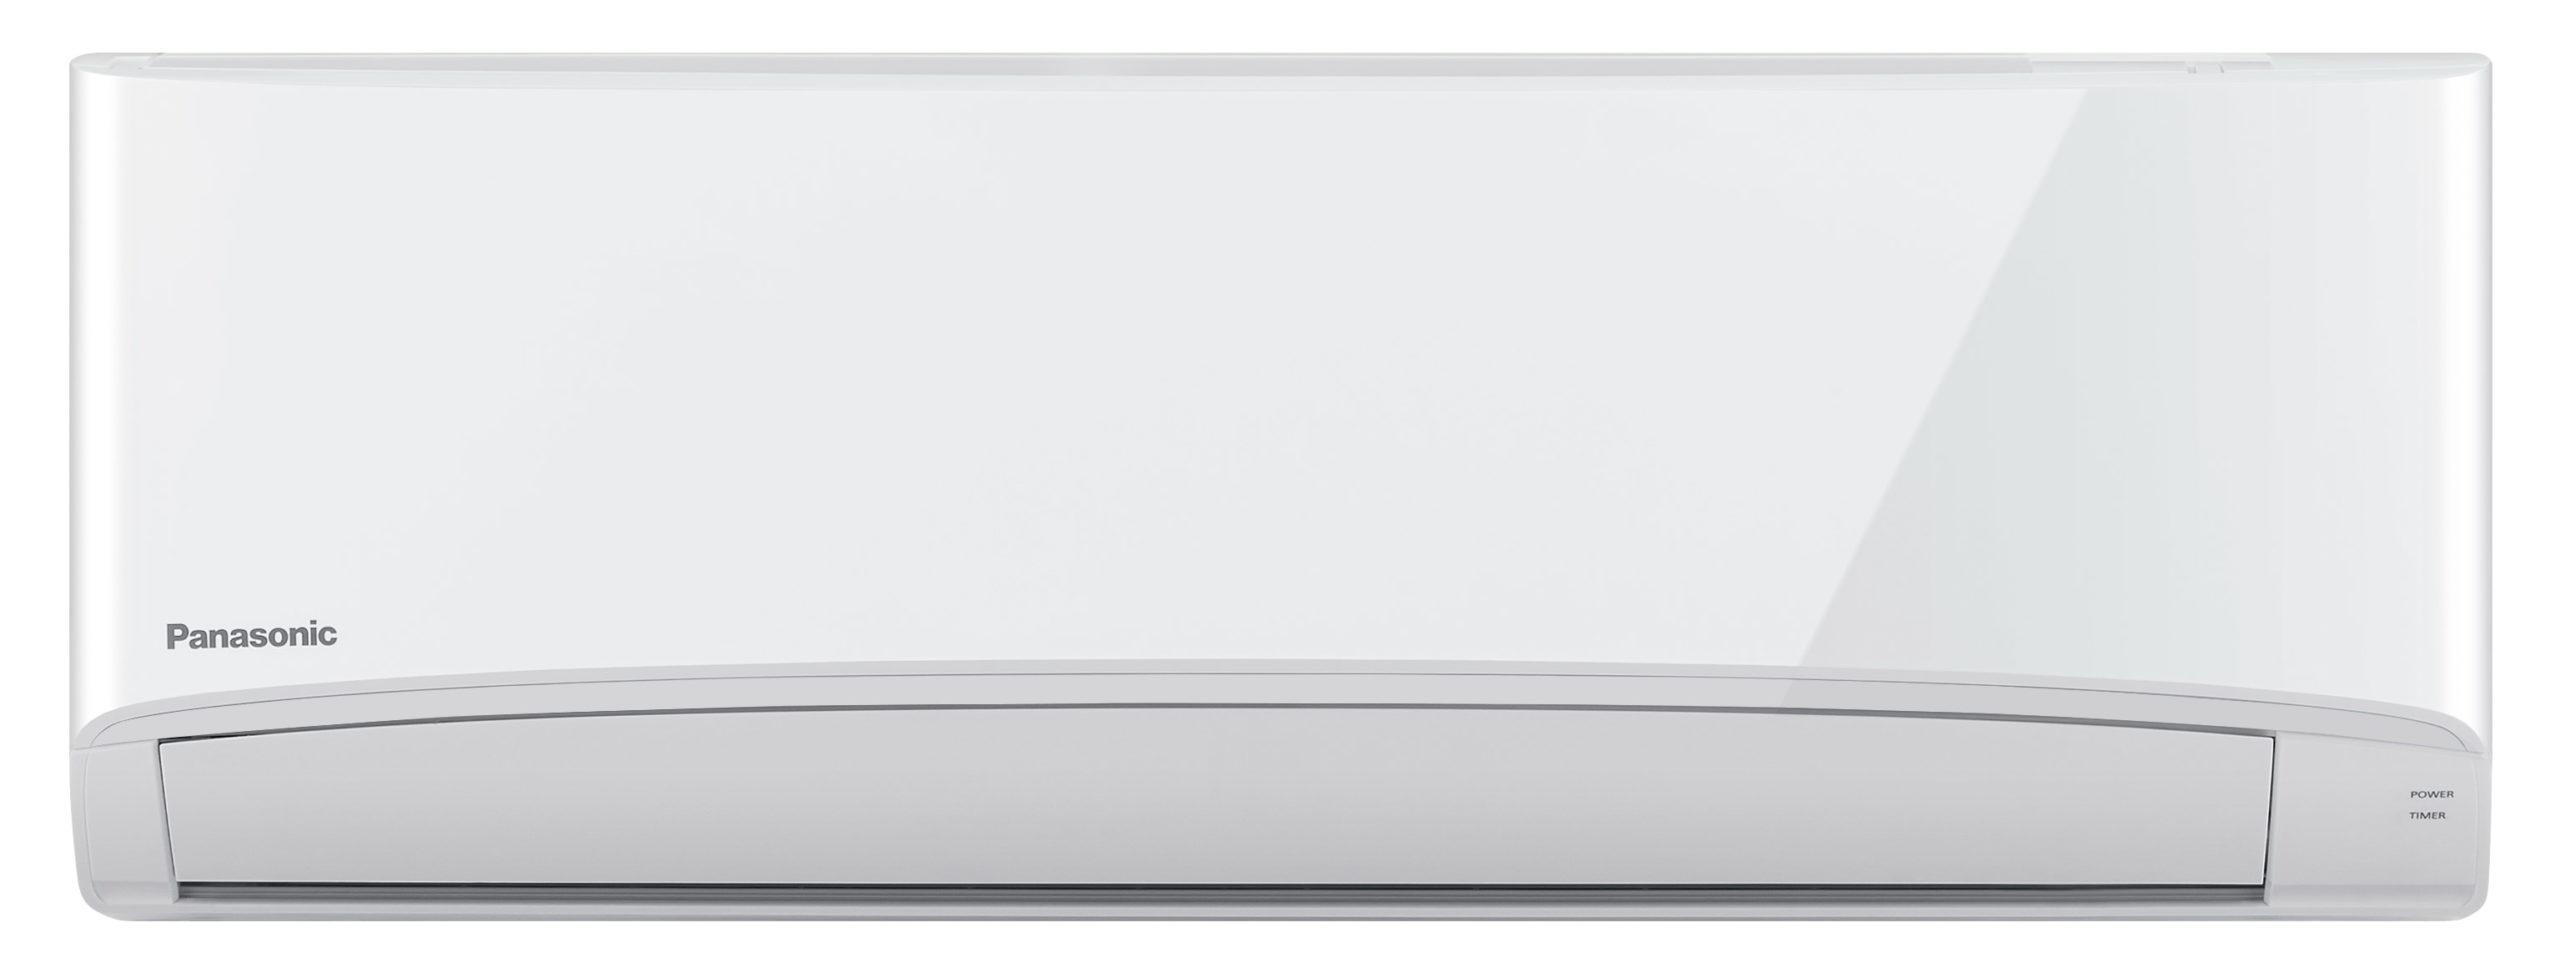 Panasonic Aerowings Standard Inverter air conditioner